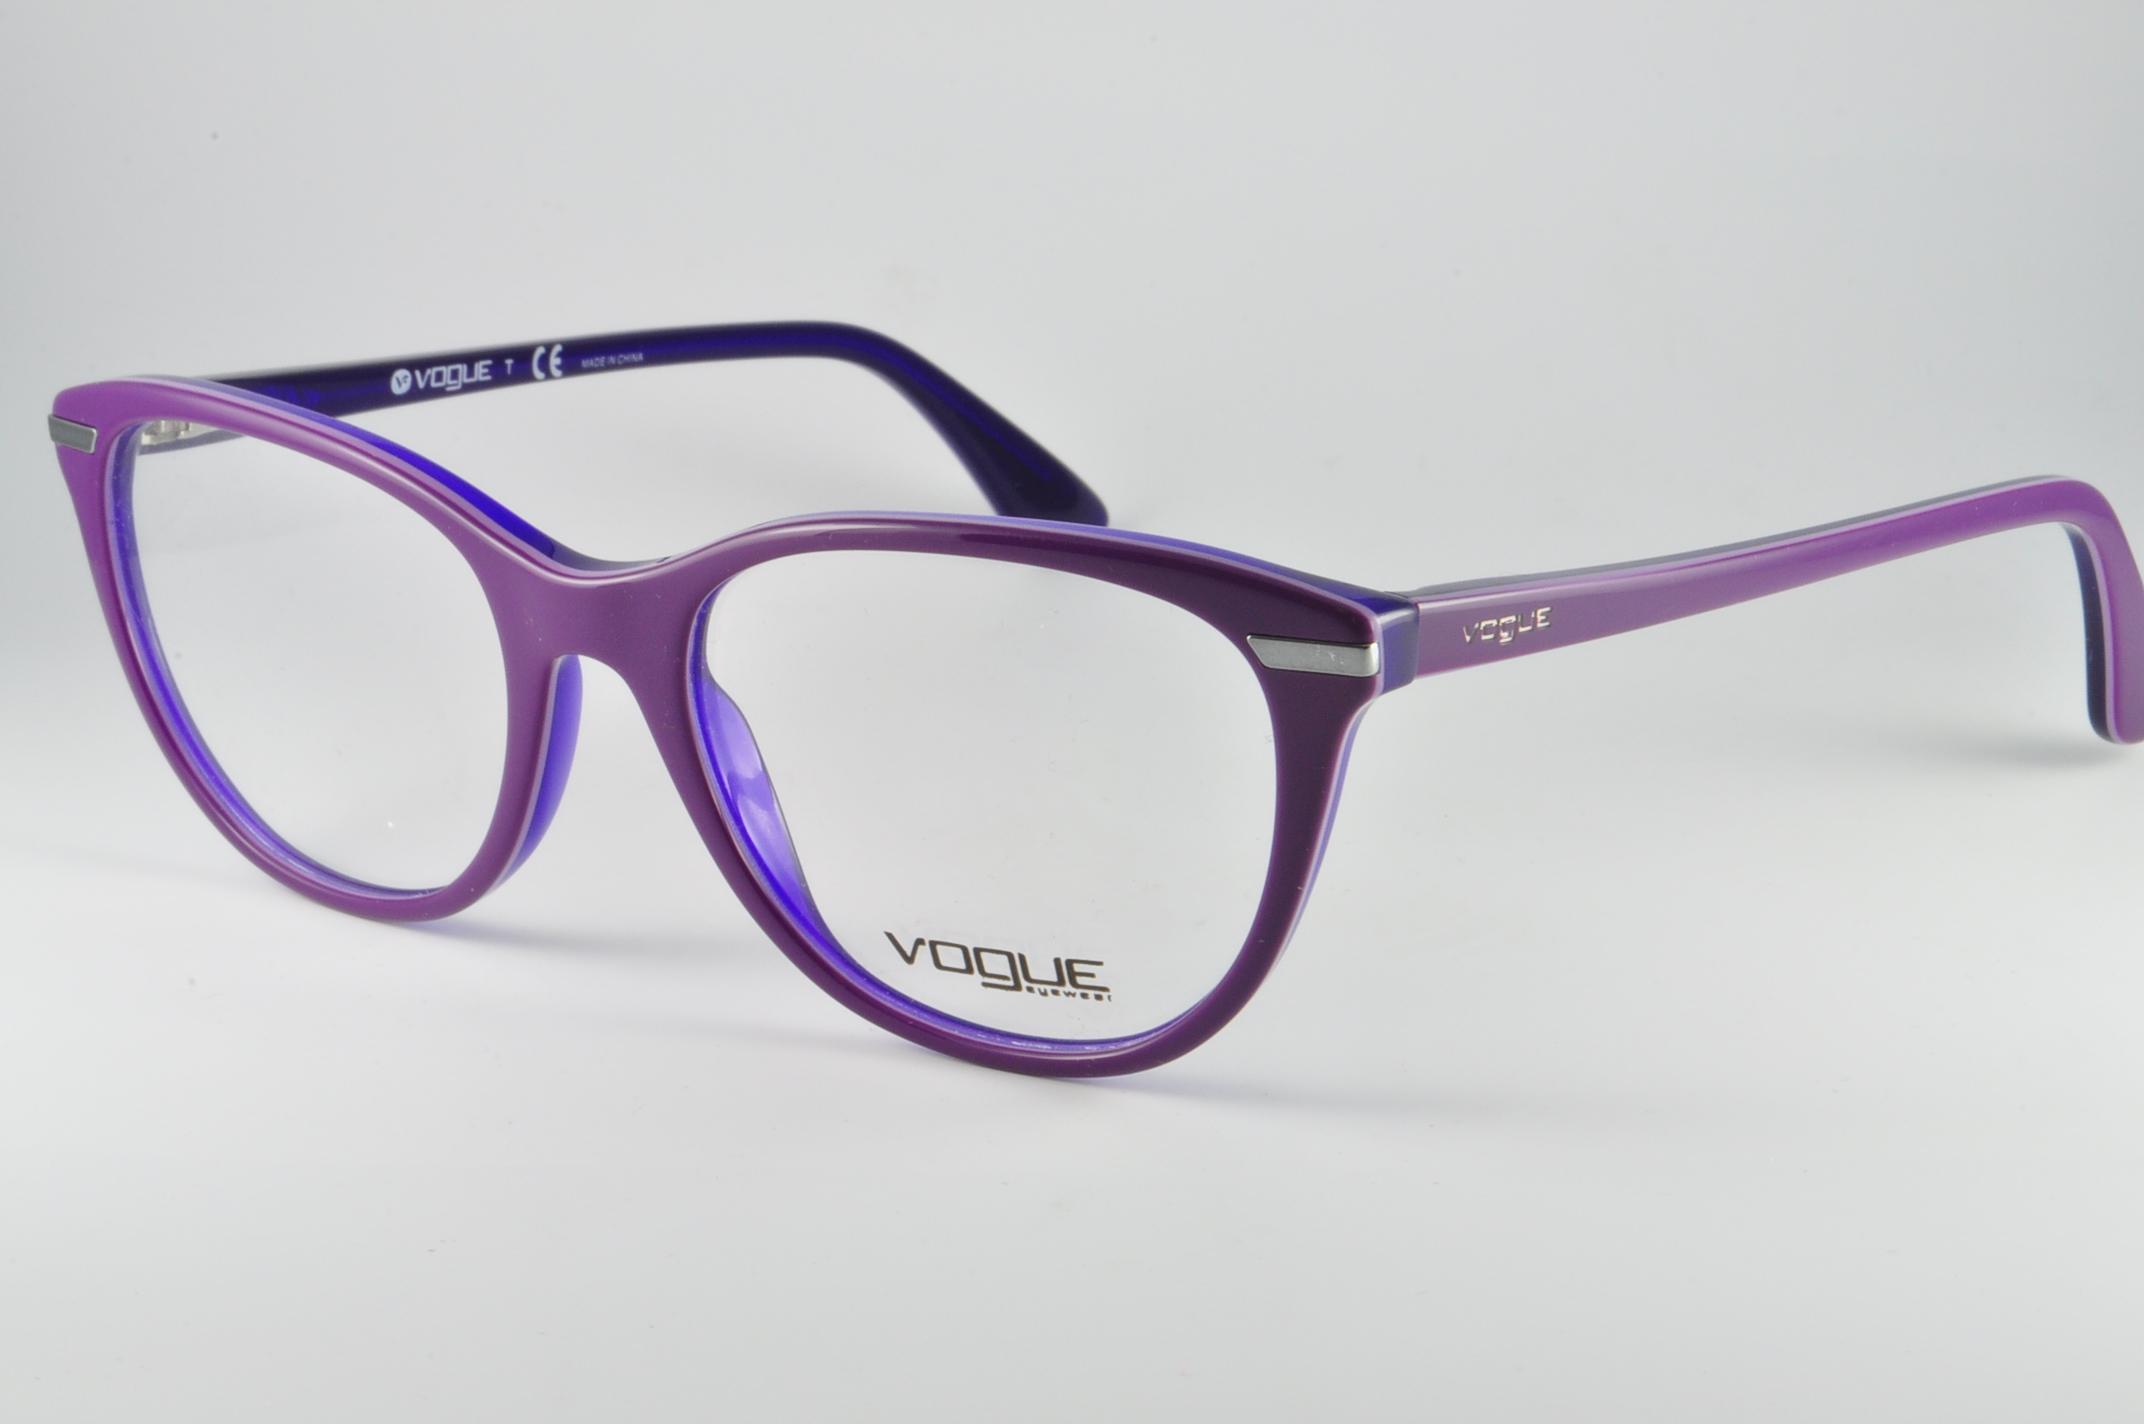 70fb63cd578 Vogue VO 2937 2277 Frames Eyeglasses 51mm - 19